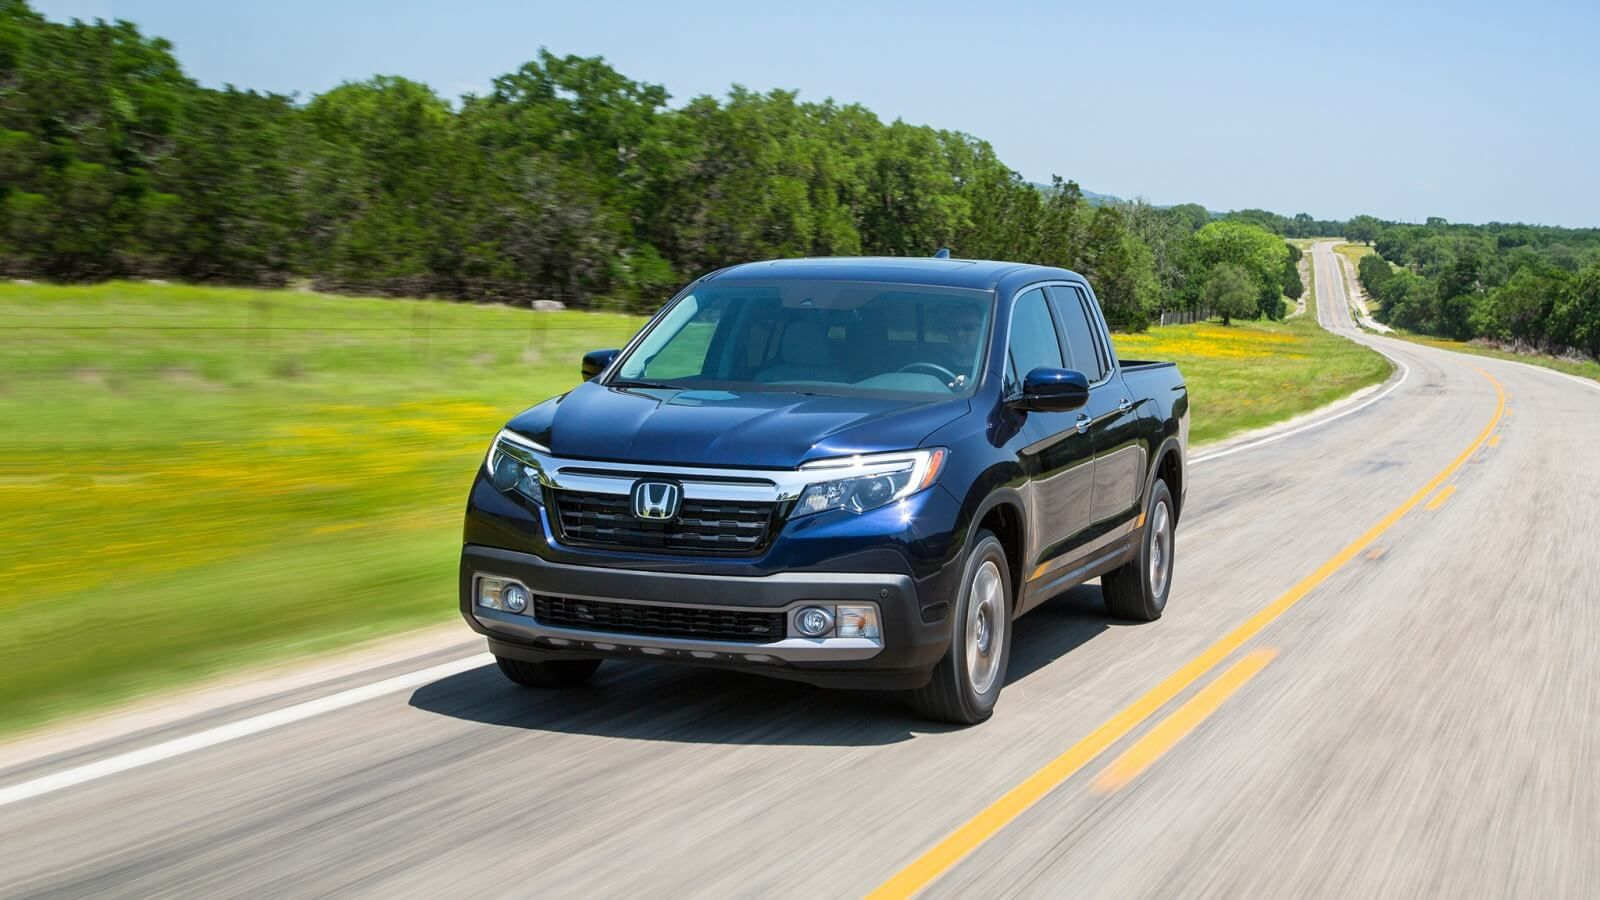 6th Avenue Honda announces that the 2019 Honda Ridgeline